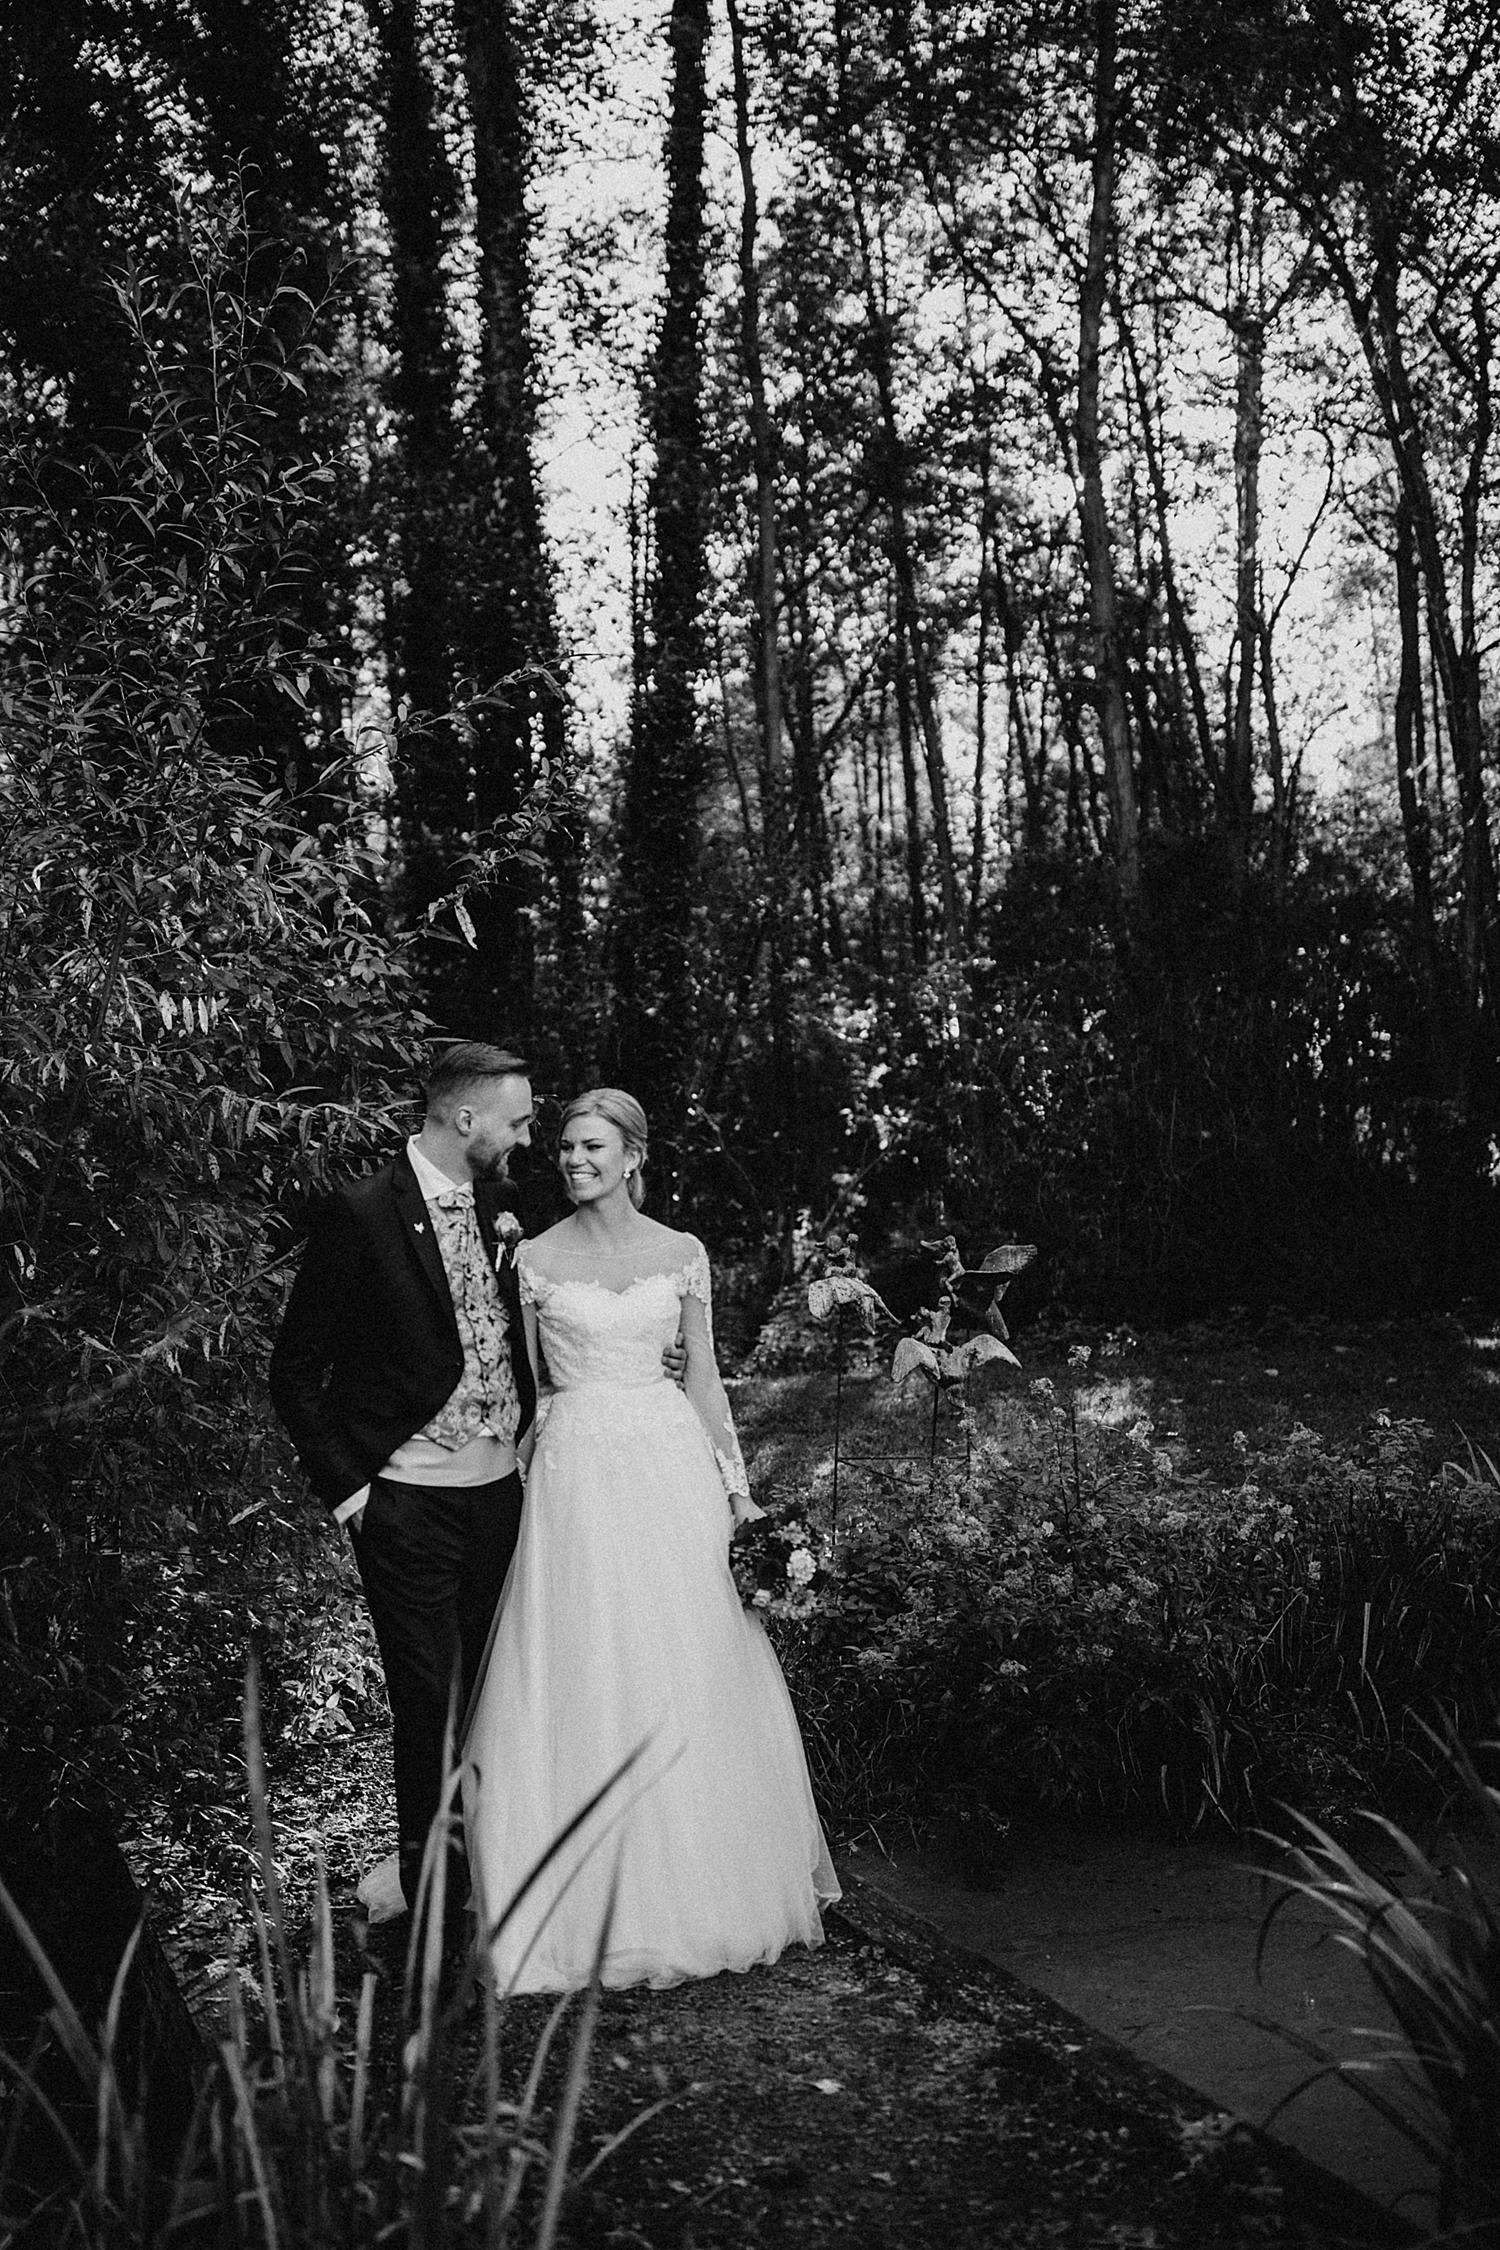 Bruidspaar wandelen in tuin Fonteinhof